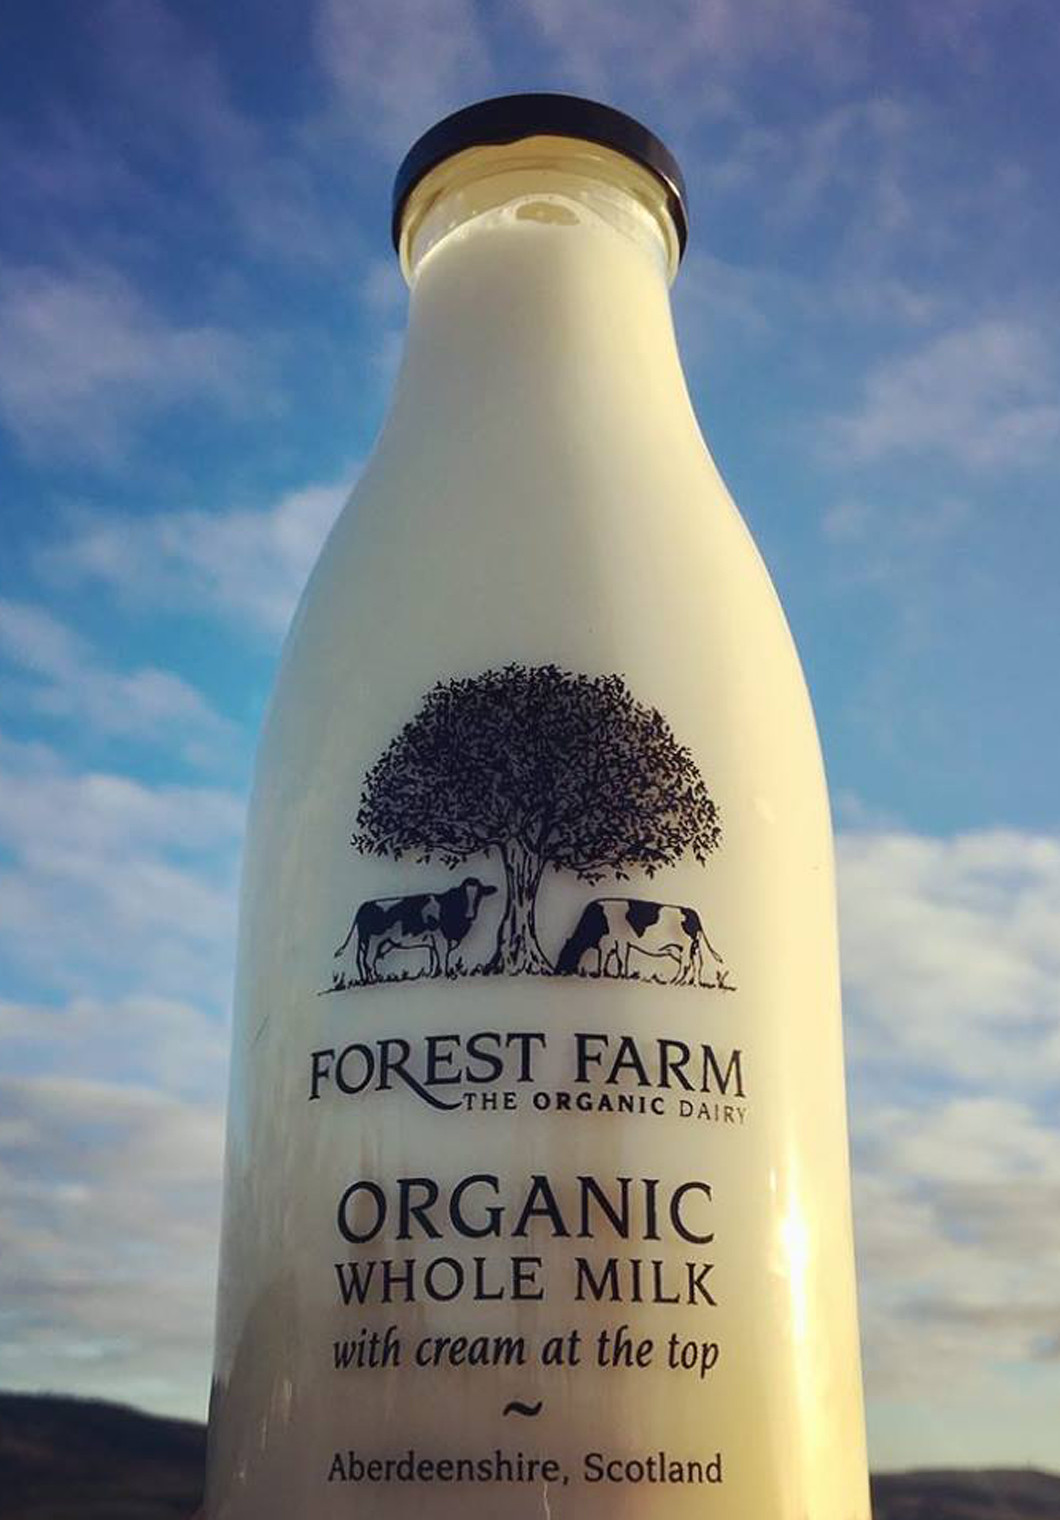 The Organic Dairy